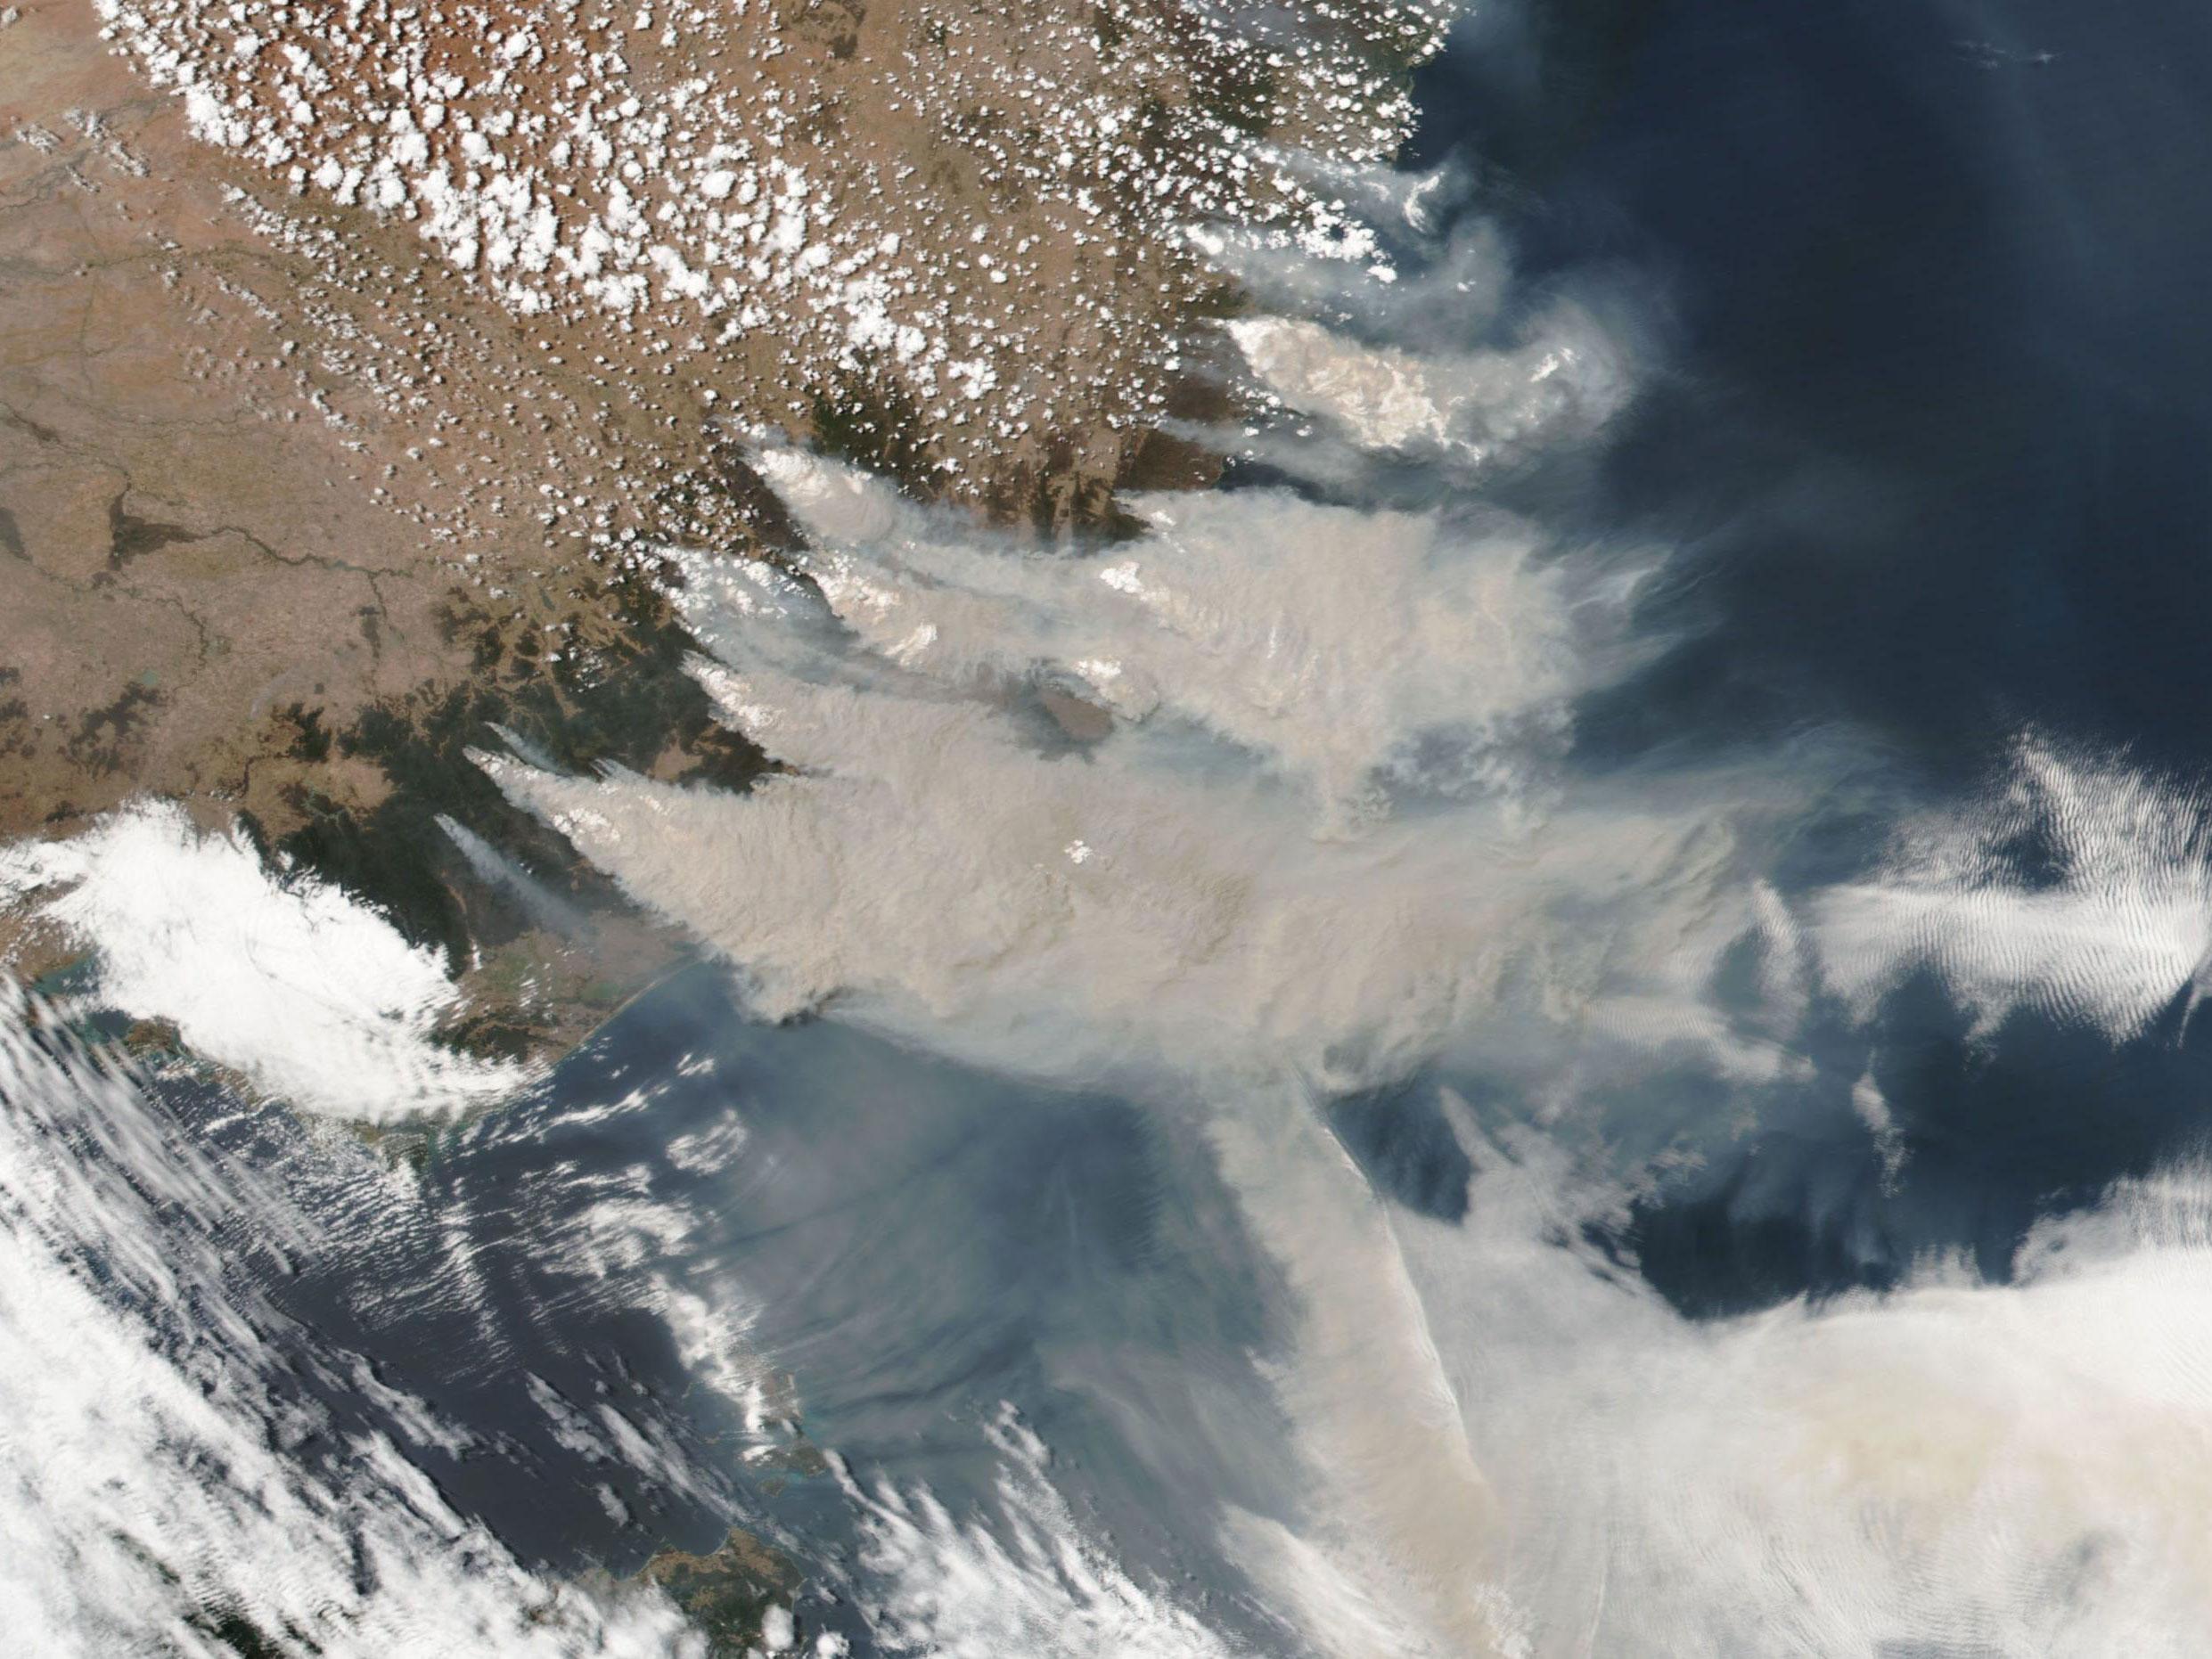 Australia Fires on 4 January 2020